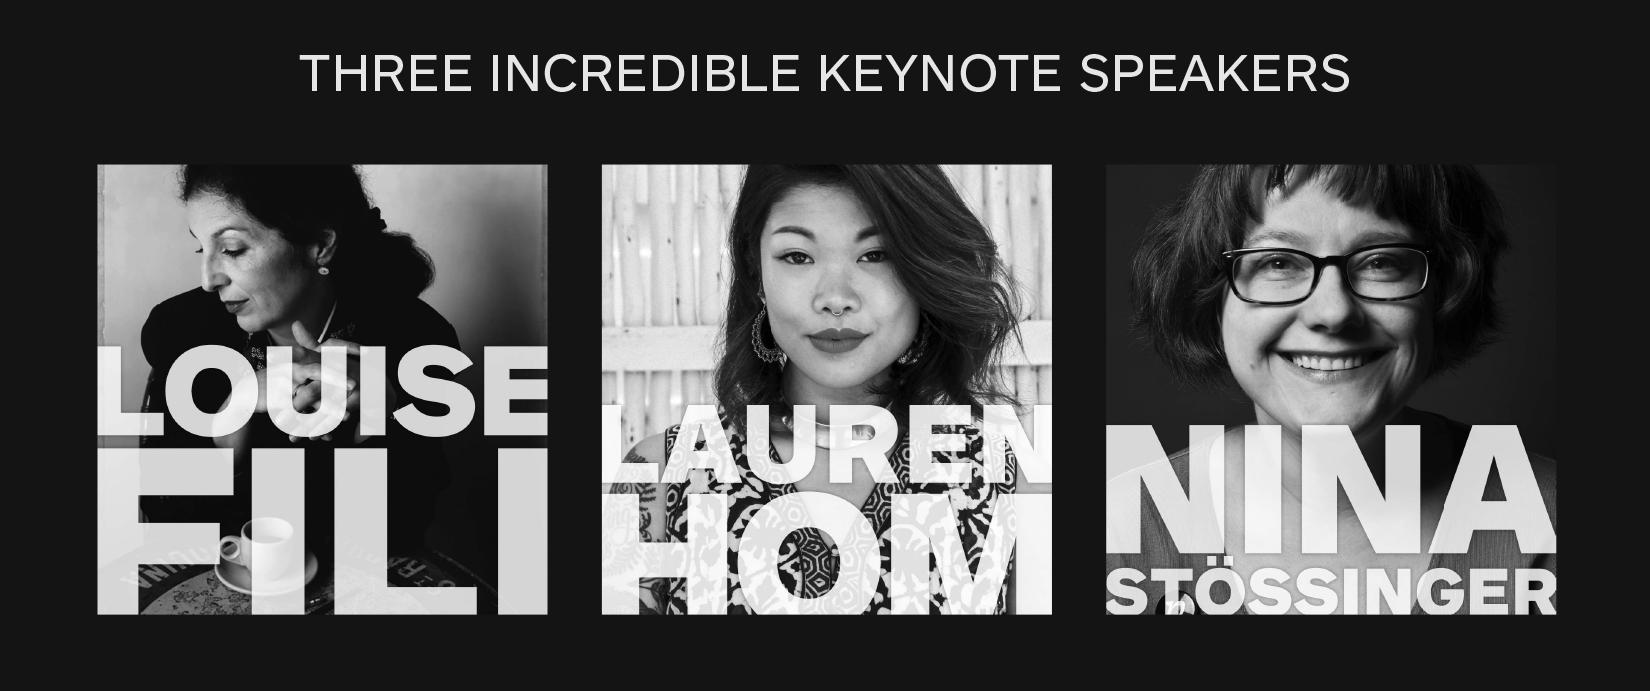 Fabulous Keynote Speakers